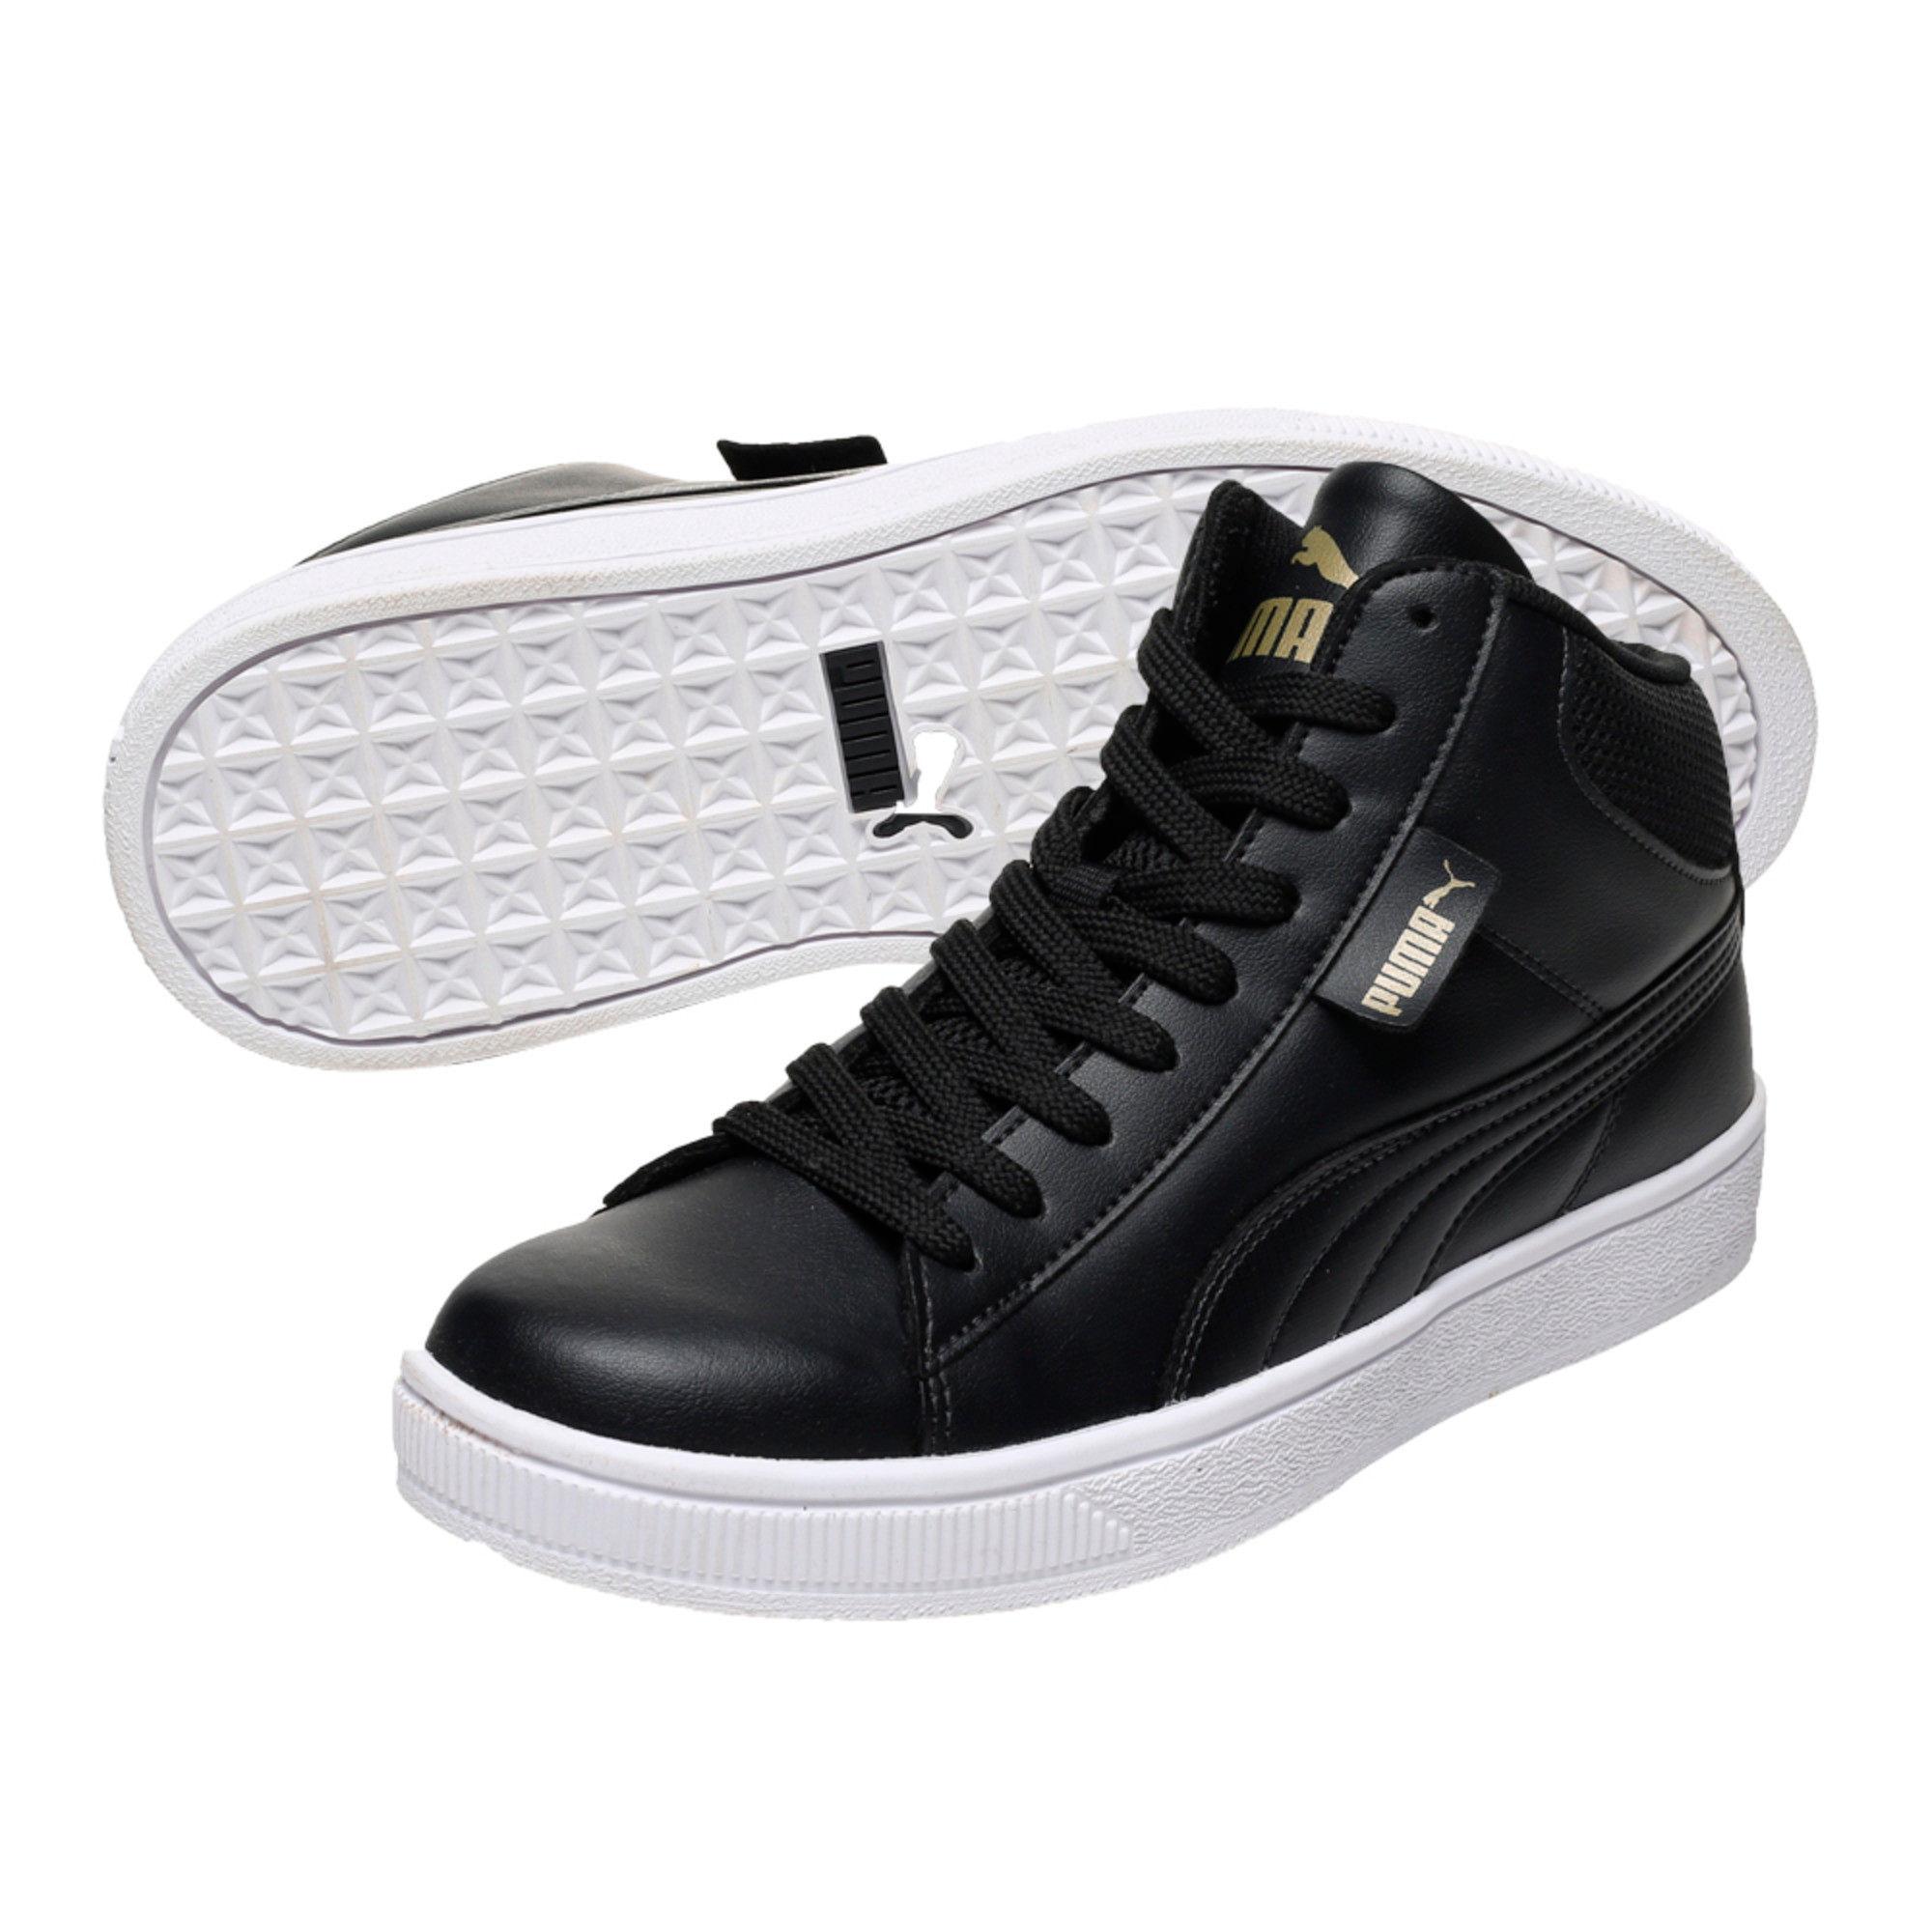 Puma 1948 Vulc Unisex Black Sneakers